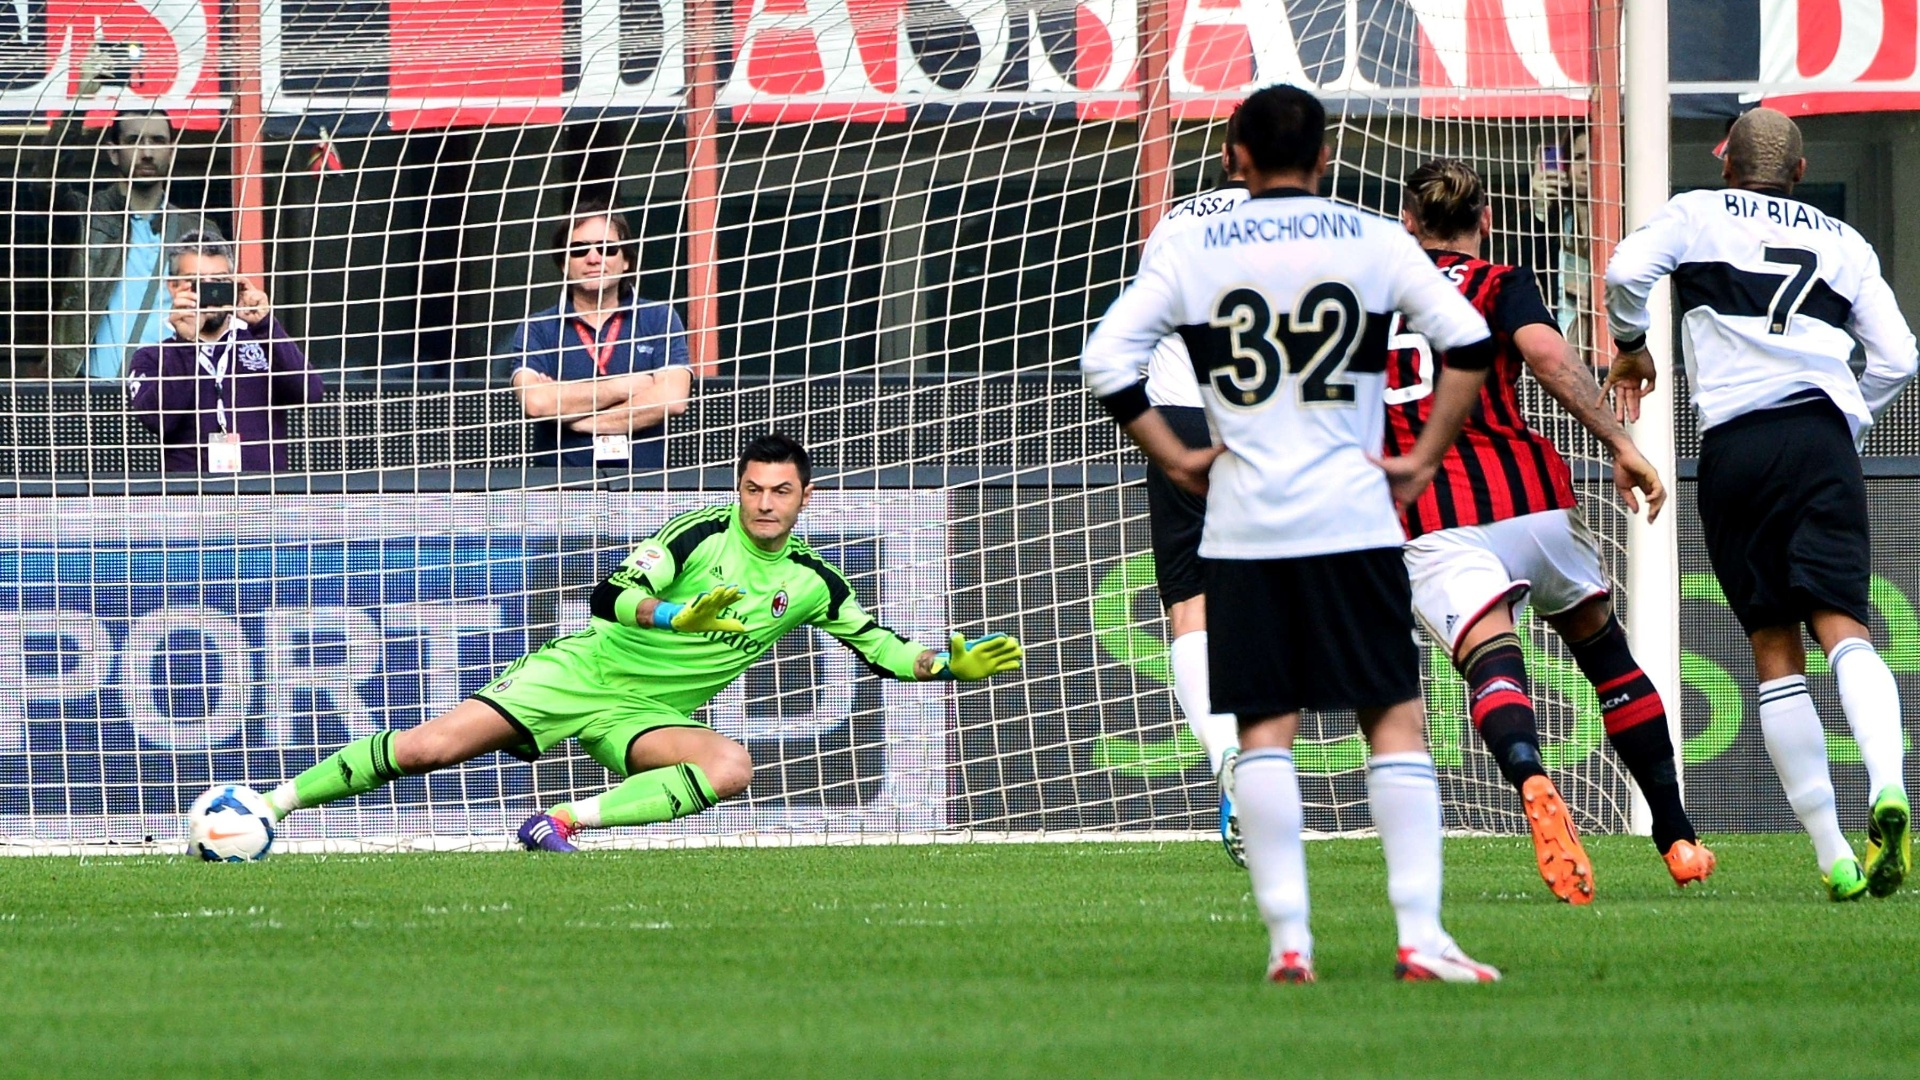 16.mar.2014 - Na partida contra o Milan, Antonio Cassano marca pelo Parma após cobrança de pênalti